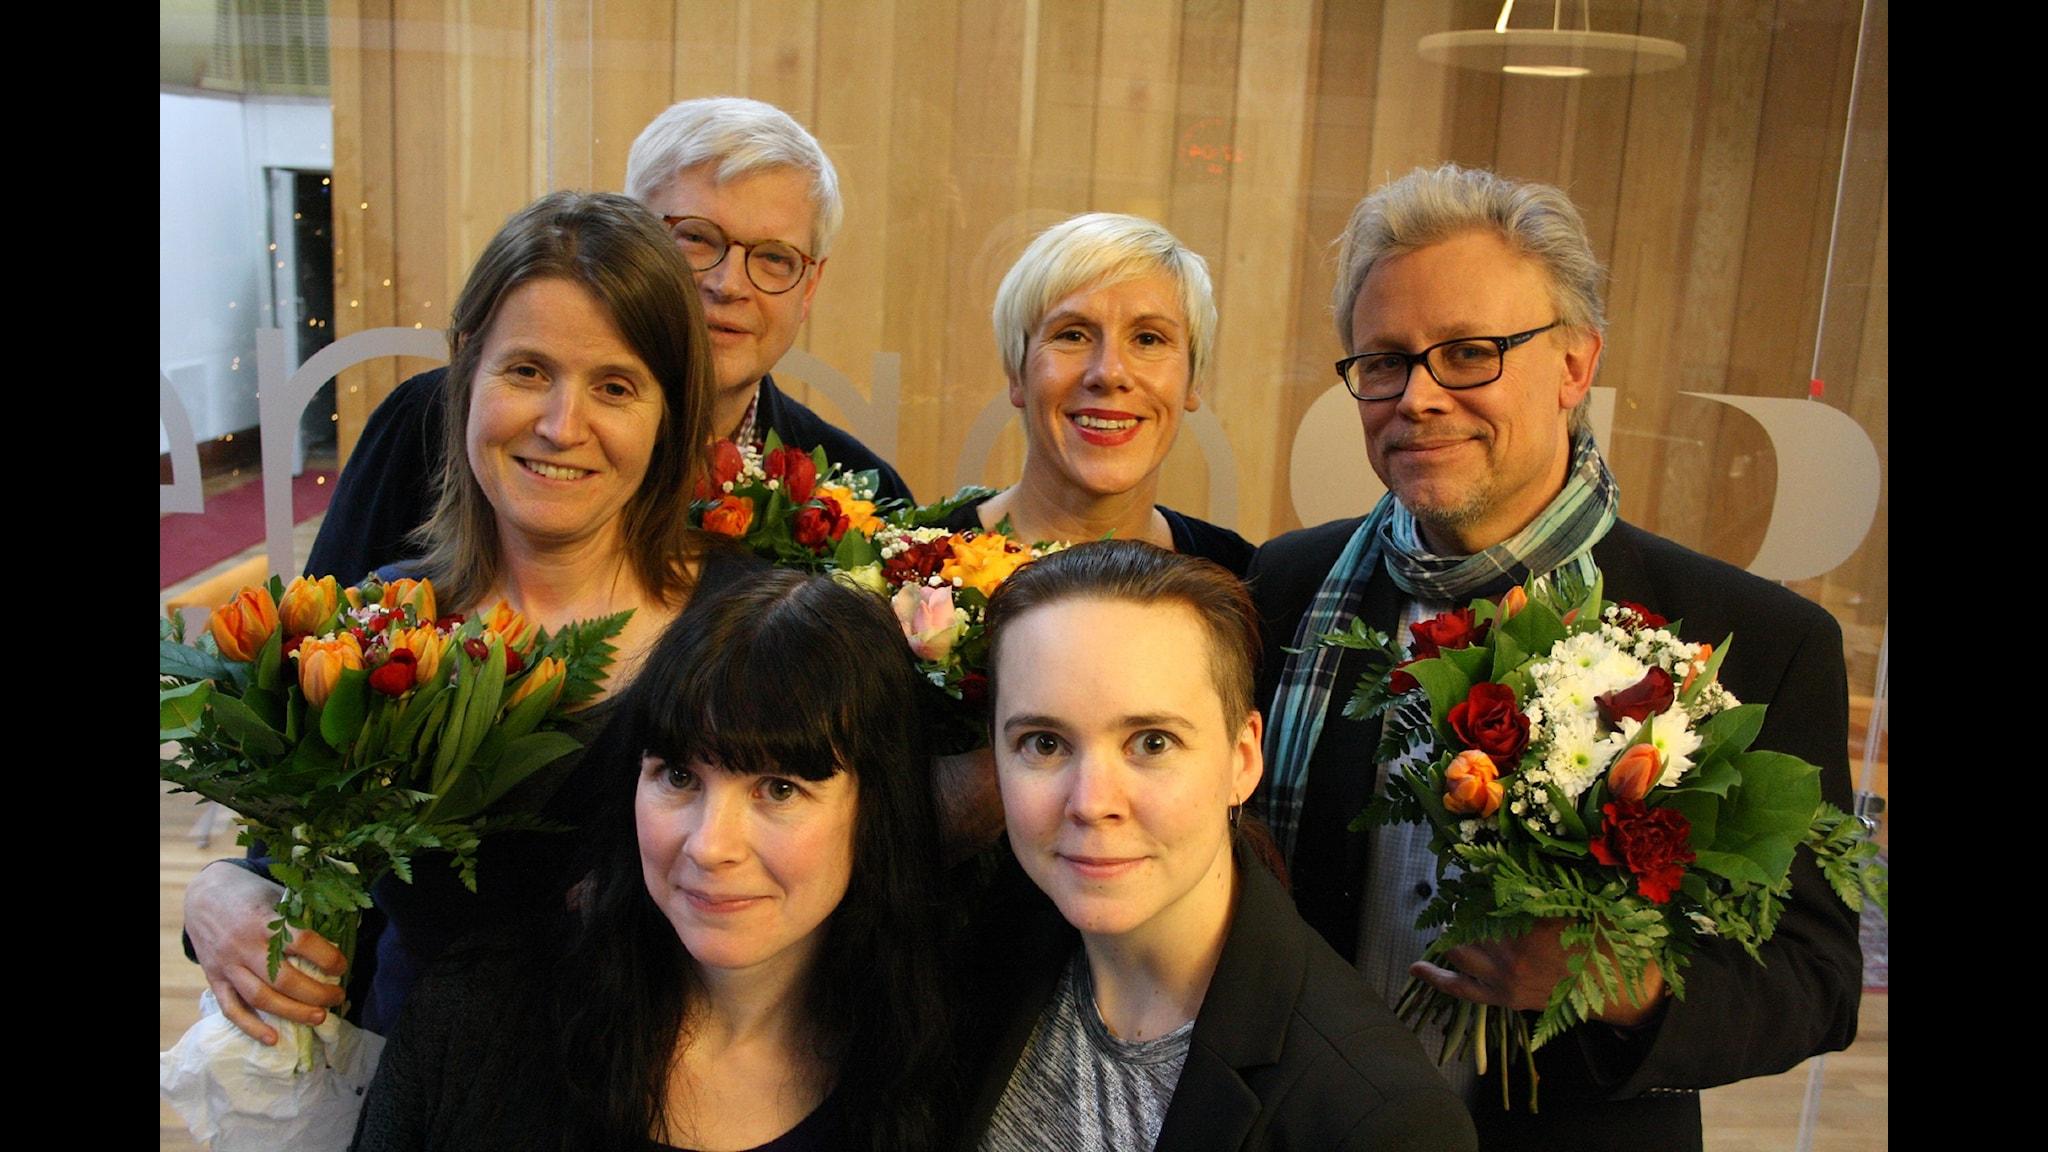 Louise Epstein och Thomas Nordegren MOT Staffan Dopping och Anna Laestadius Larsson